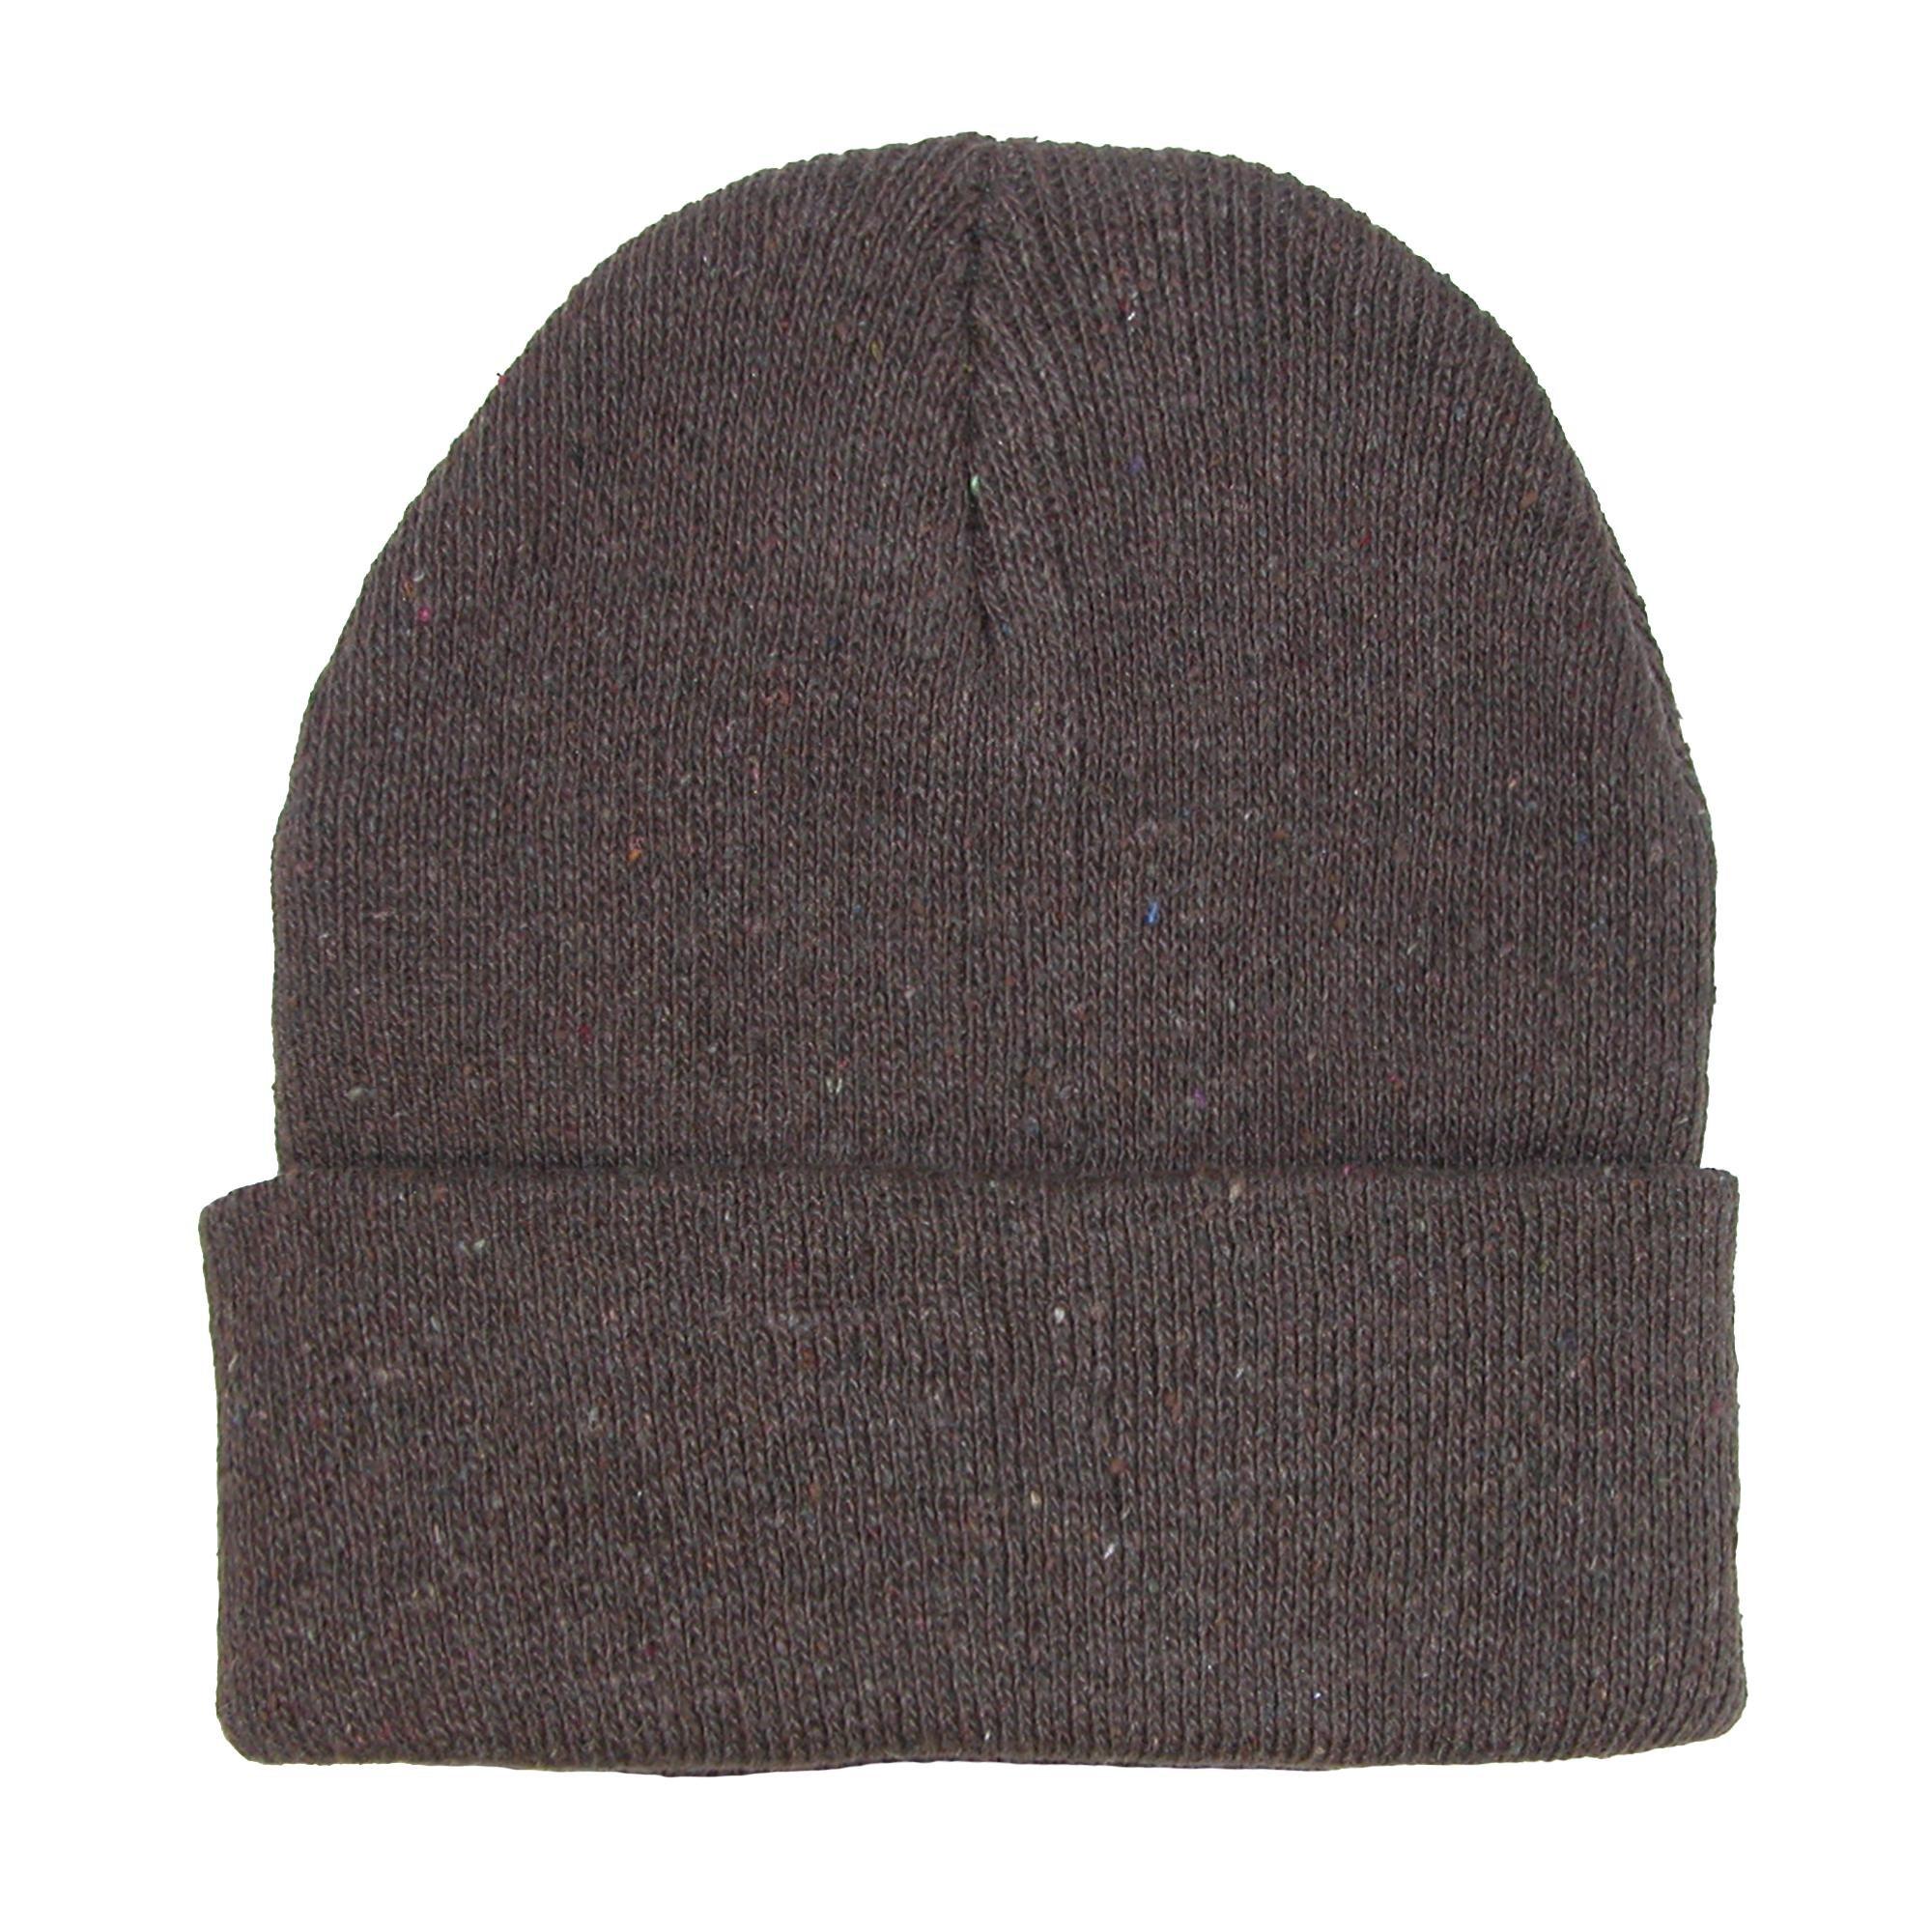 CTM Kids' Knit Winter Cuff Stocking Cap, Brown